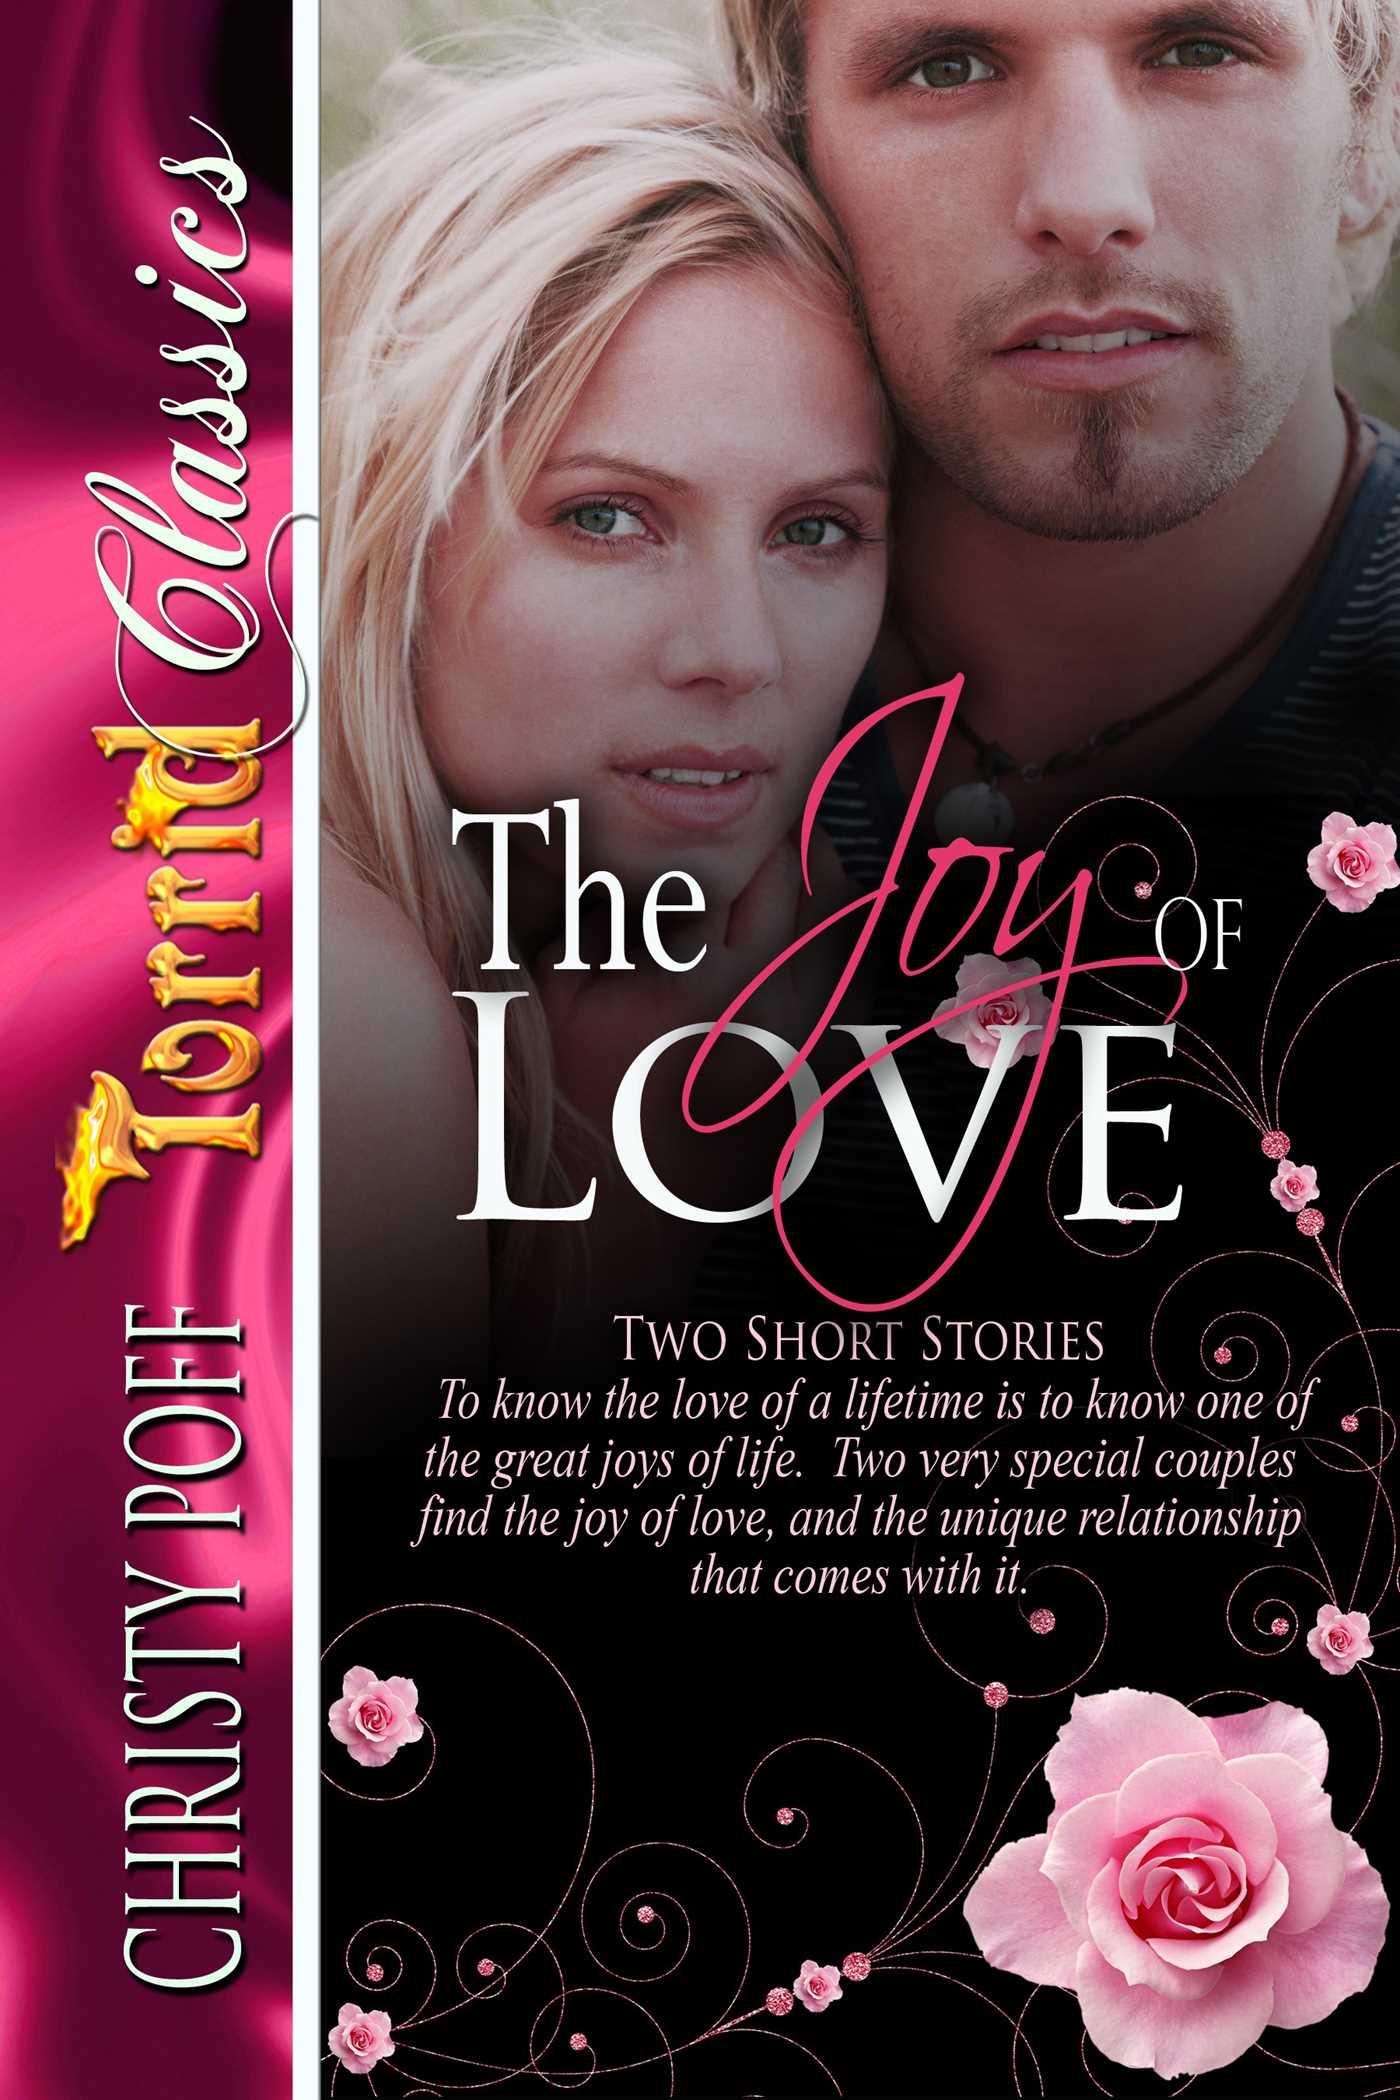 The joy of love 9781593749934 hr